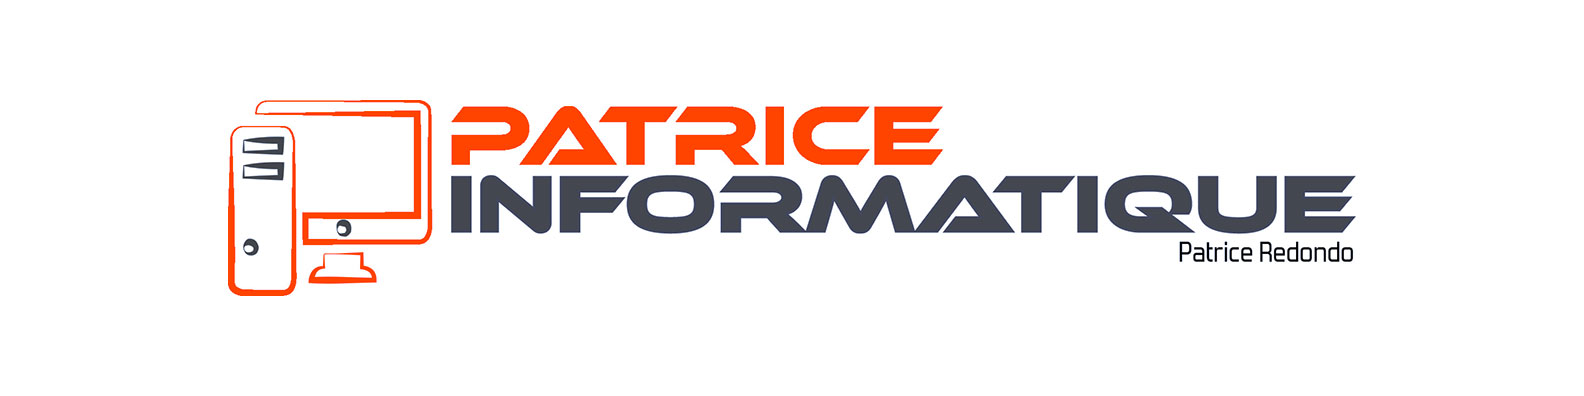 1629816784_f8cfe69d526f-logo_patrice_informatique_2019_linkedin.jpg